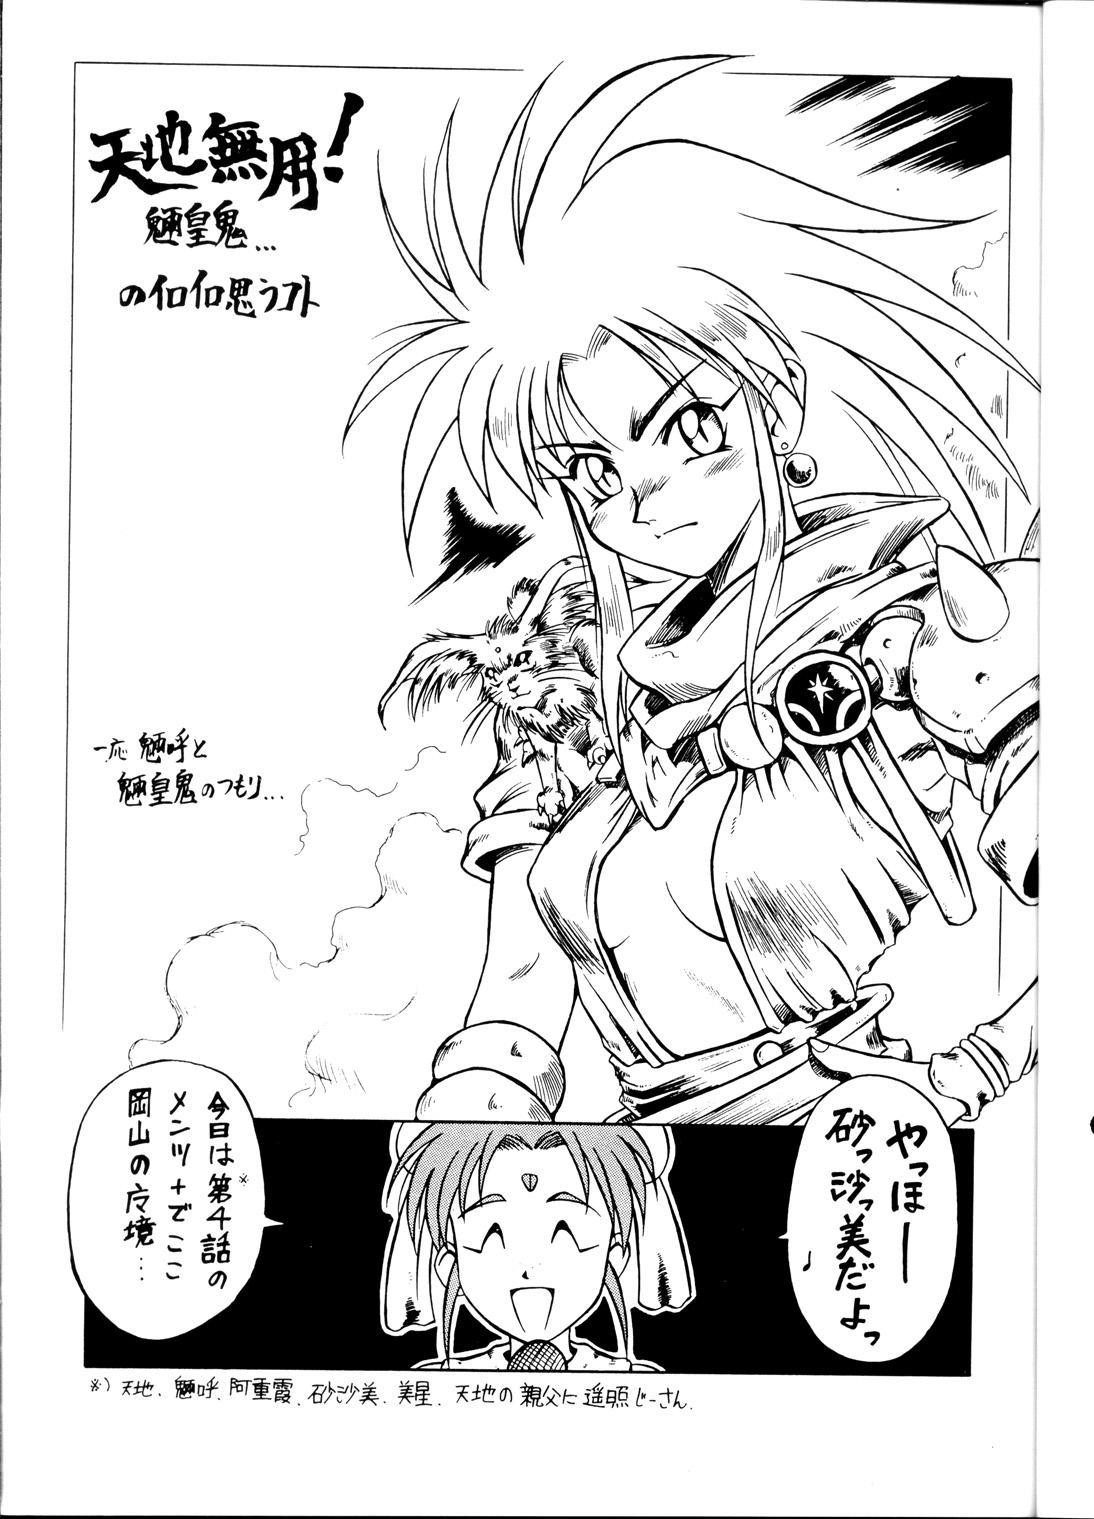 [B.B.C] Tenchi Muyou! Ryou-ou-ki Kaiteiben (Tenchi Muyou!) 7